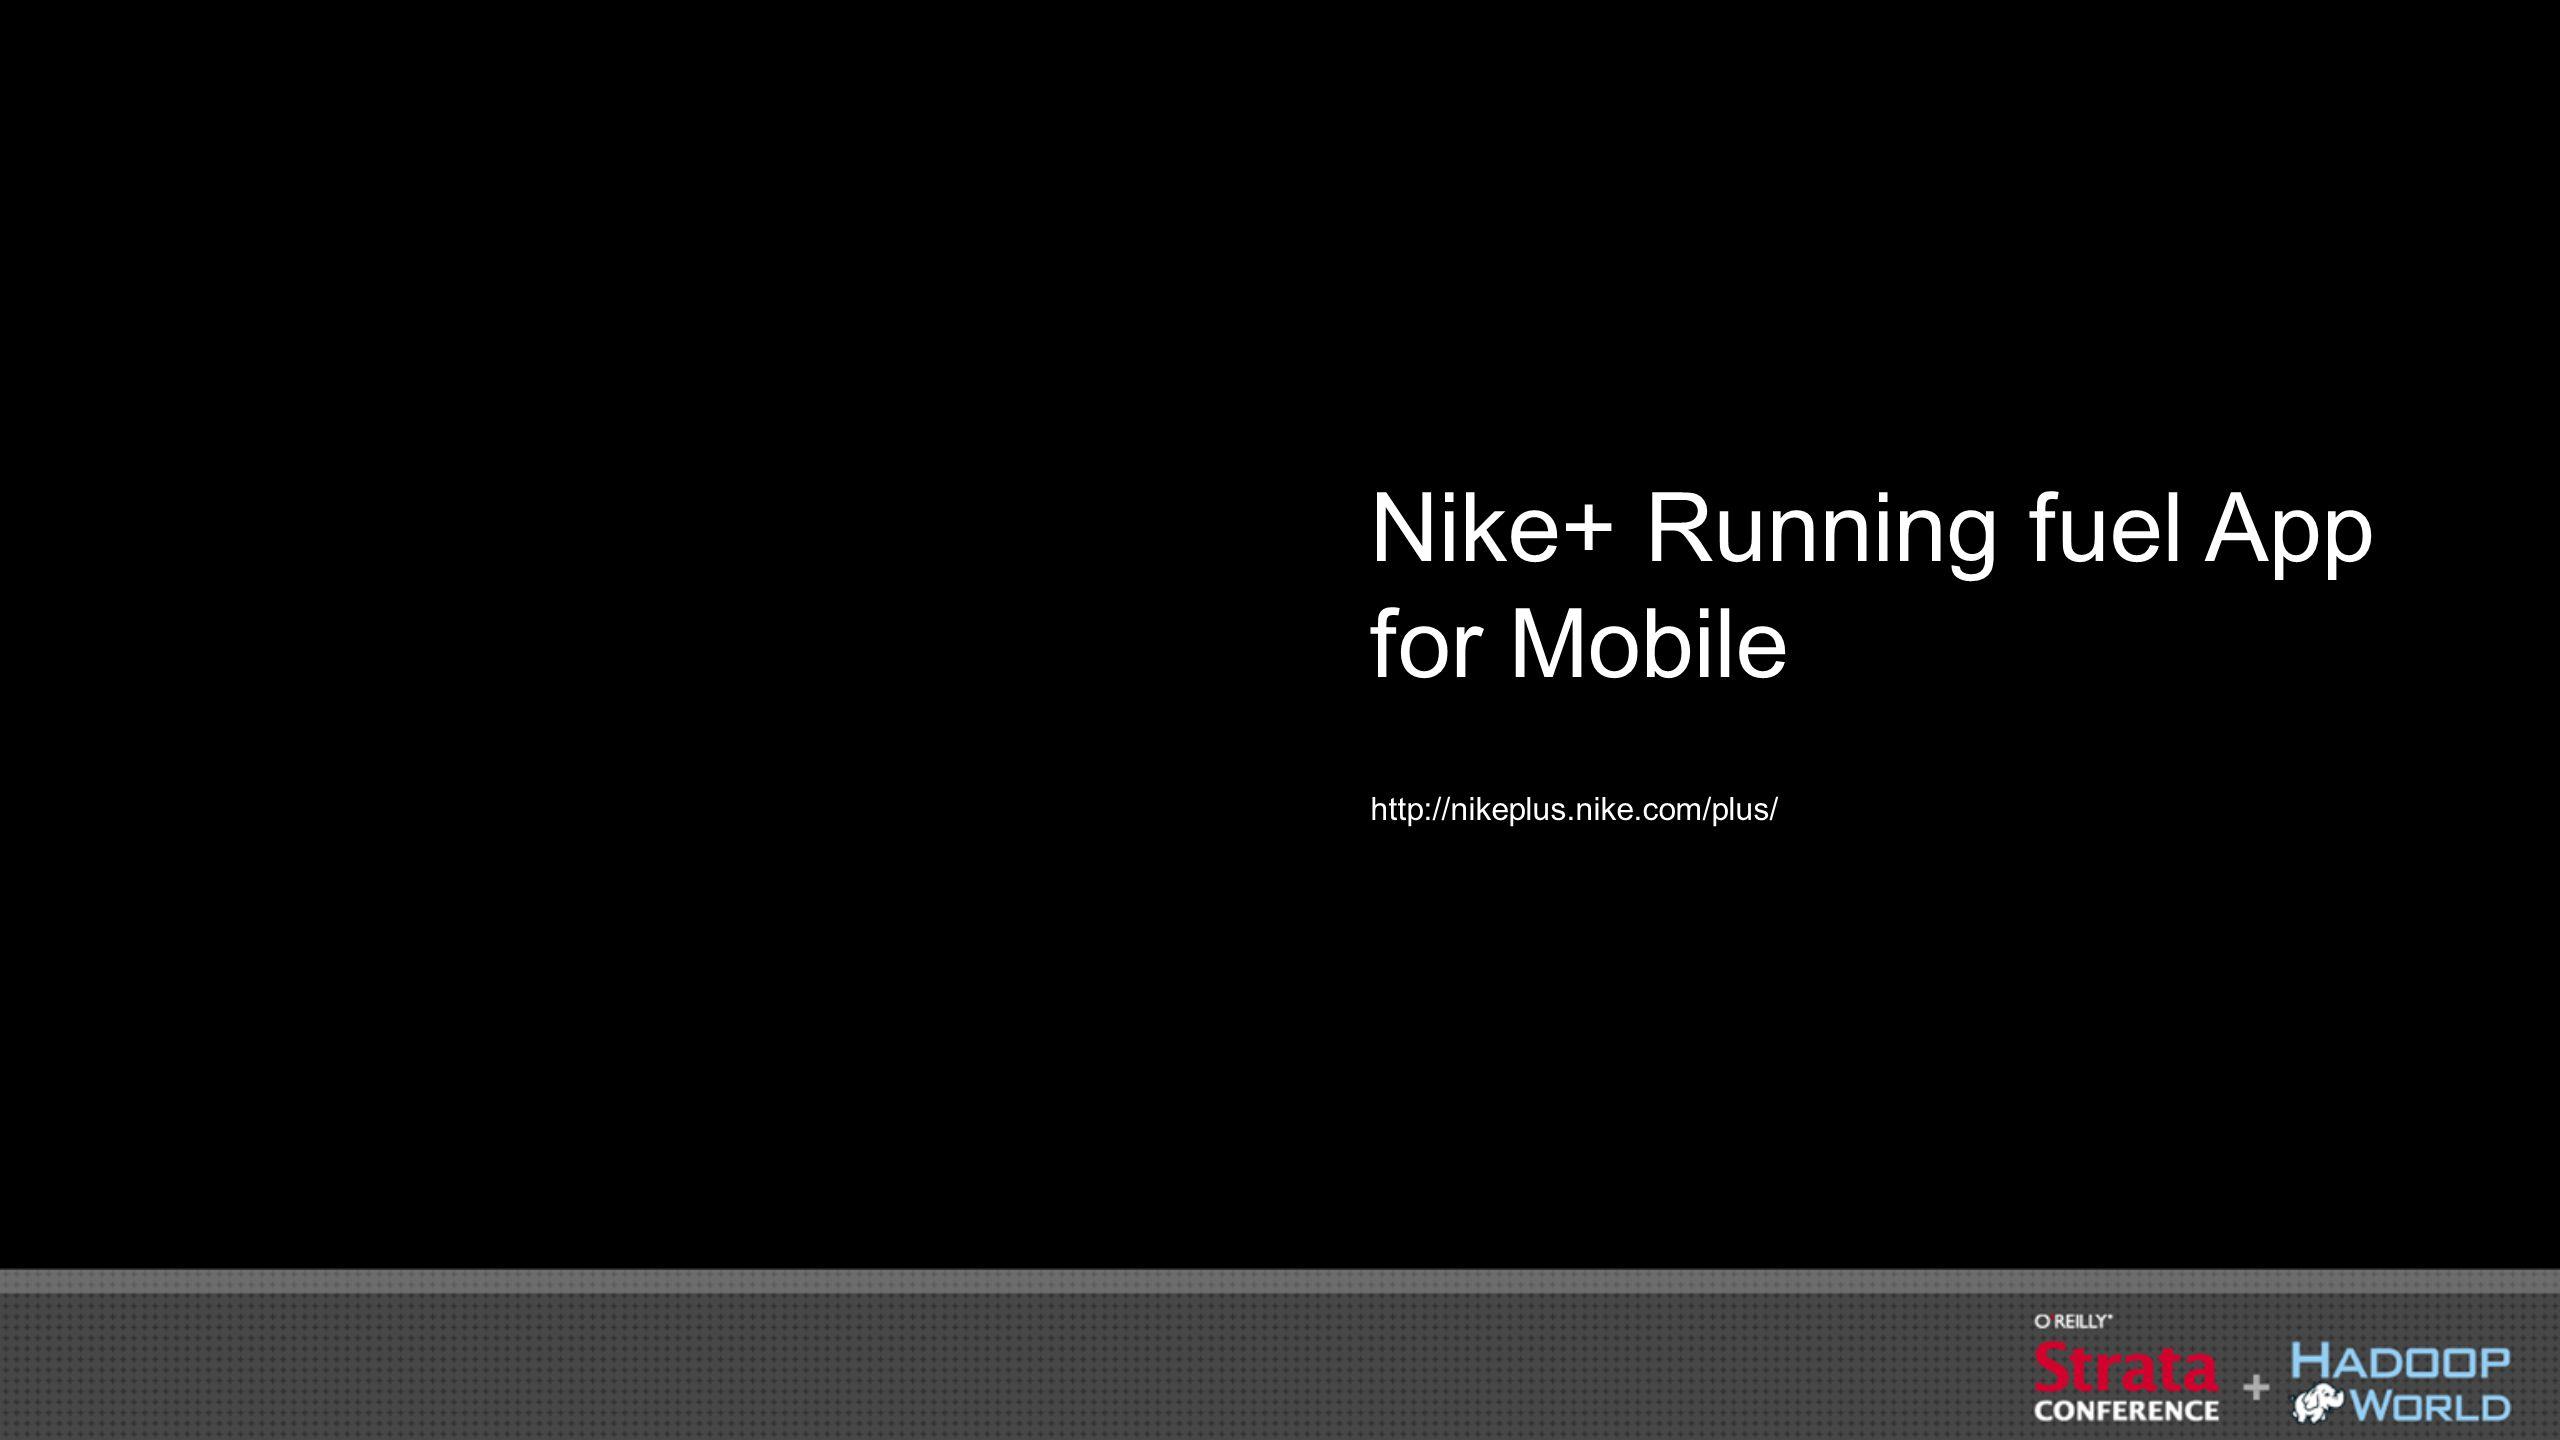 Nike+ Running fuel App for Mobile http://nikeplus.nike.com/plus/